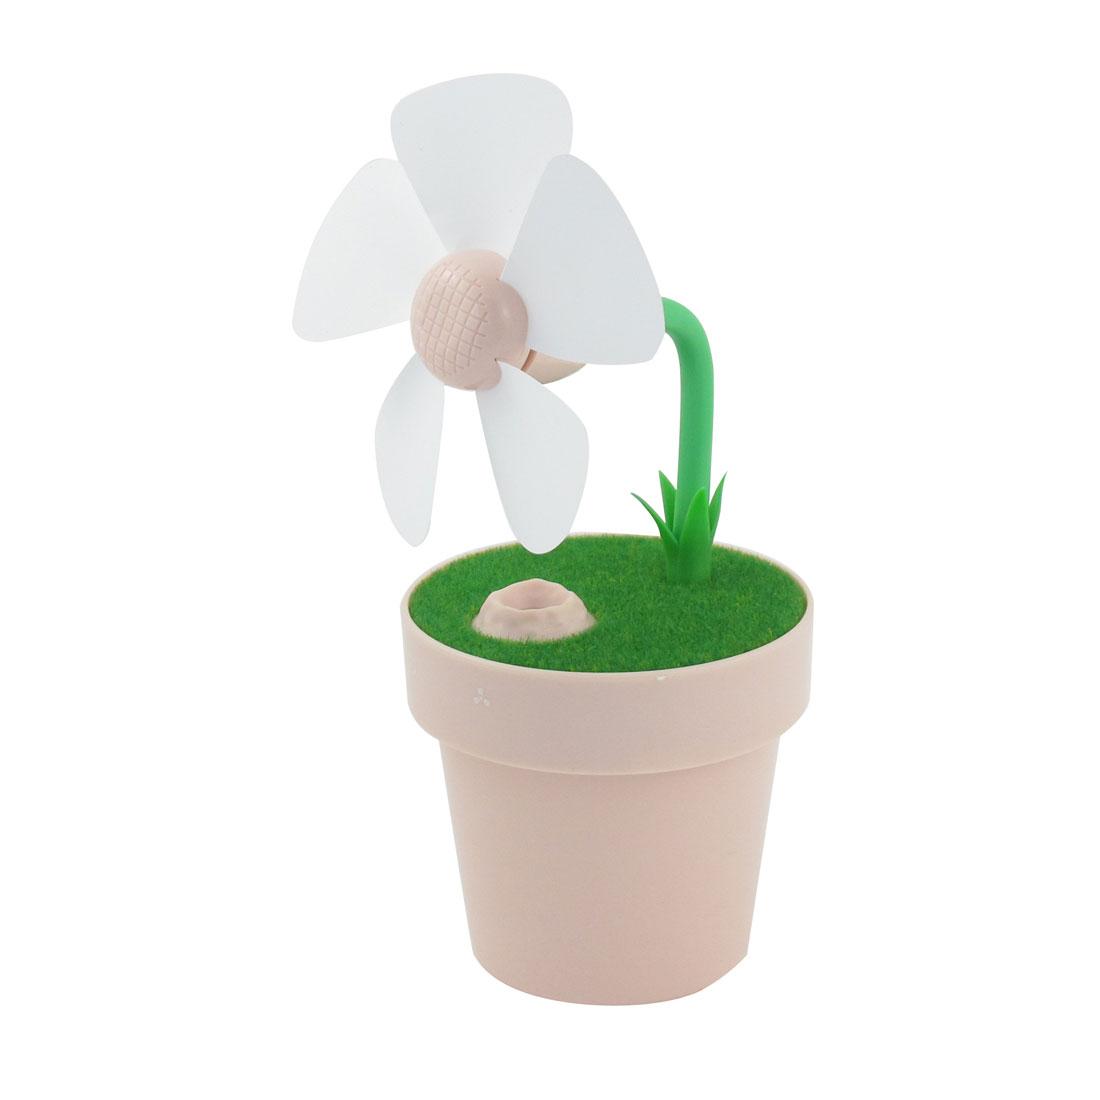 Summer Household Mini Flower Pot Air Purification USB Humidifier Fan Pink